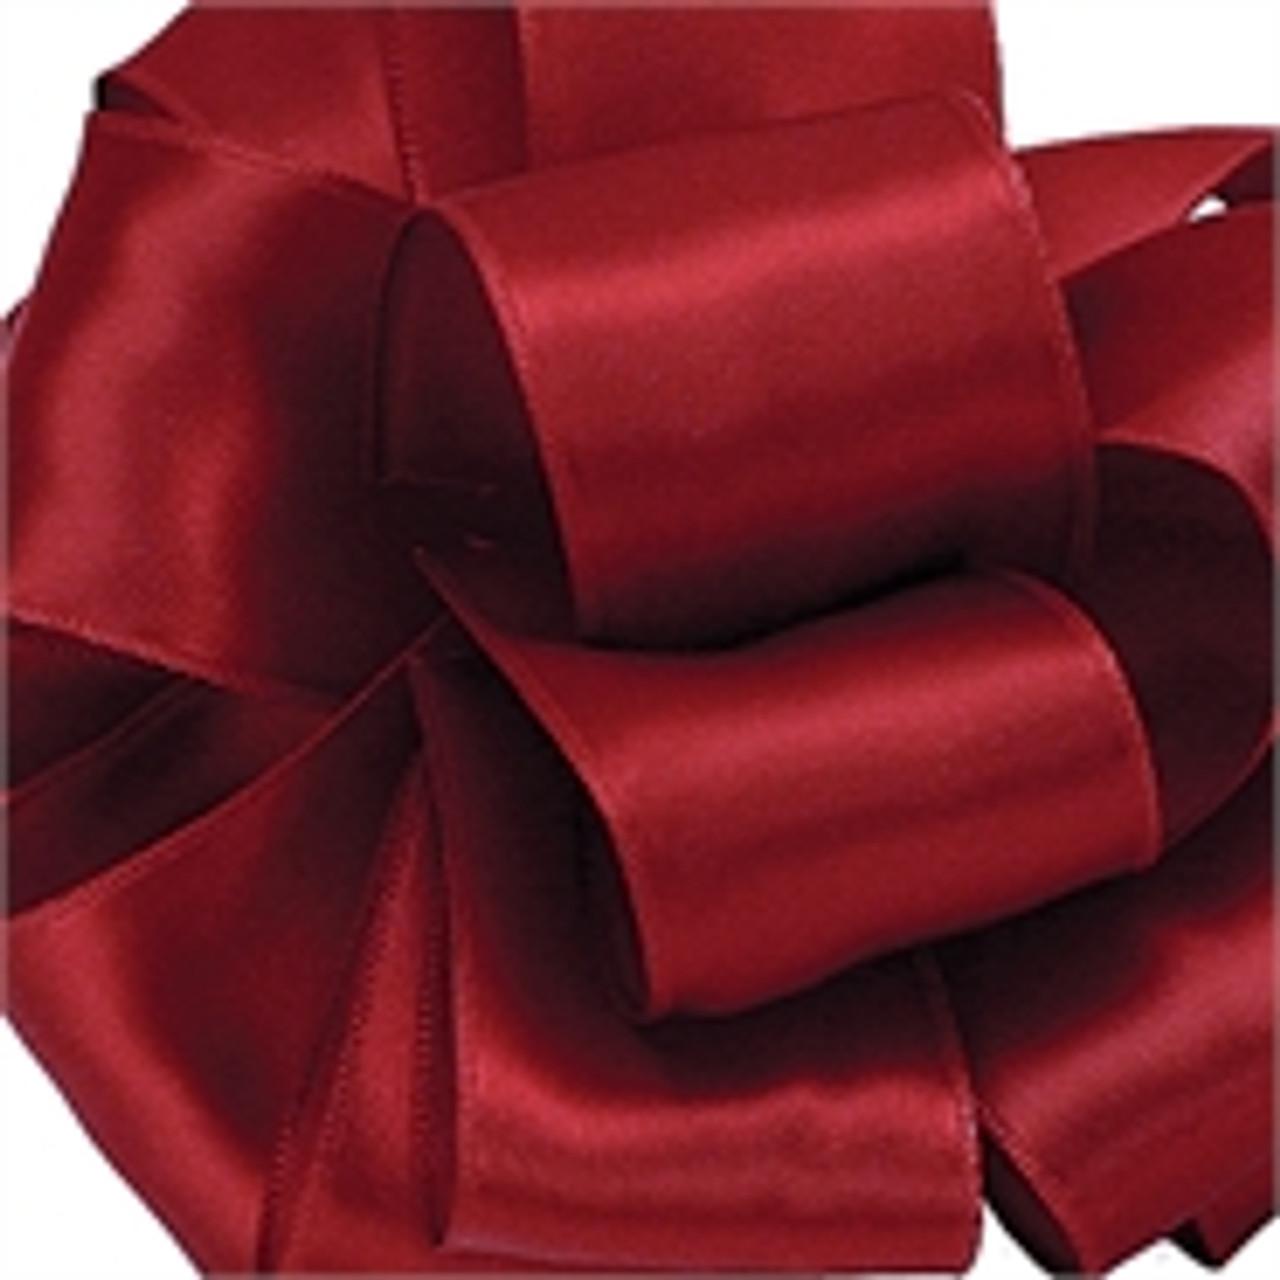 Scarlet Wired Satin Ribbon